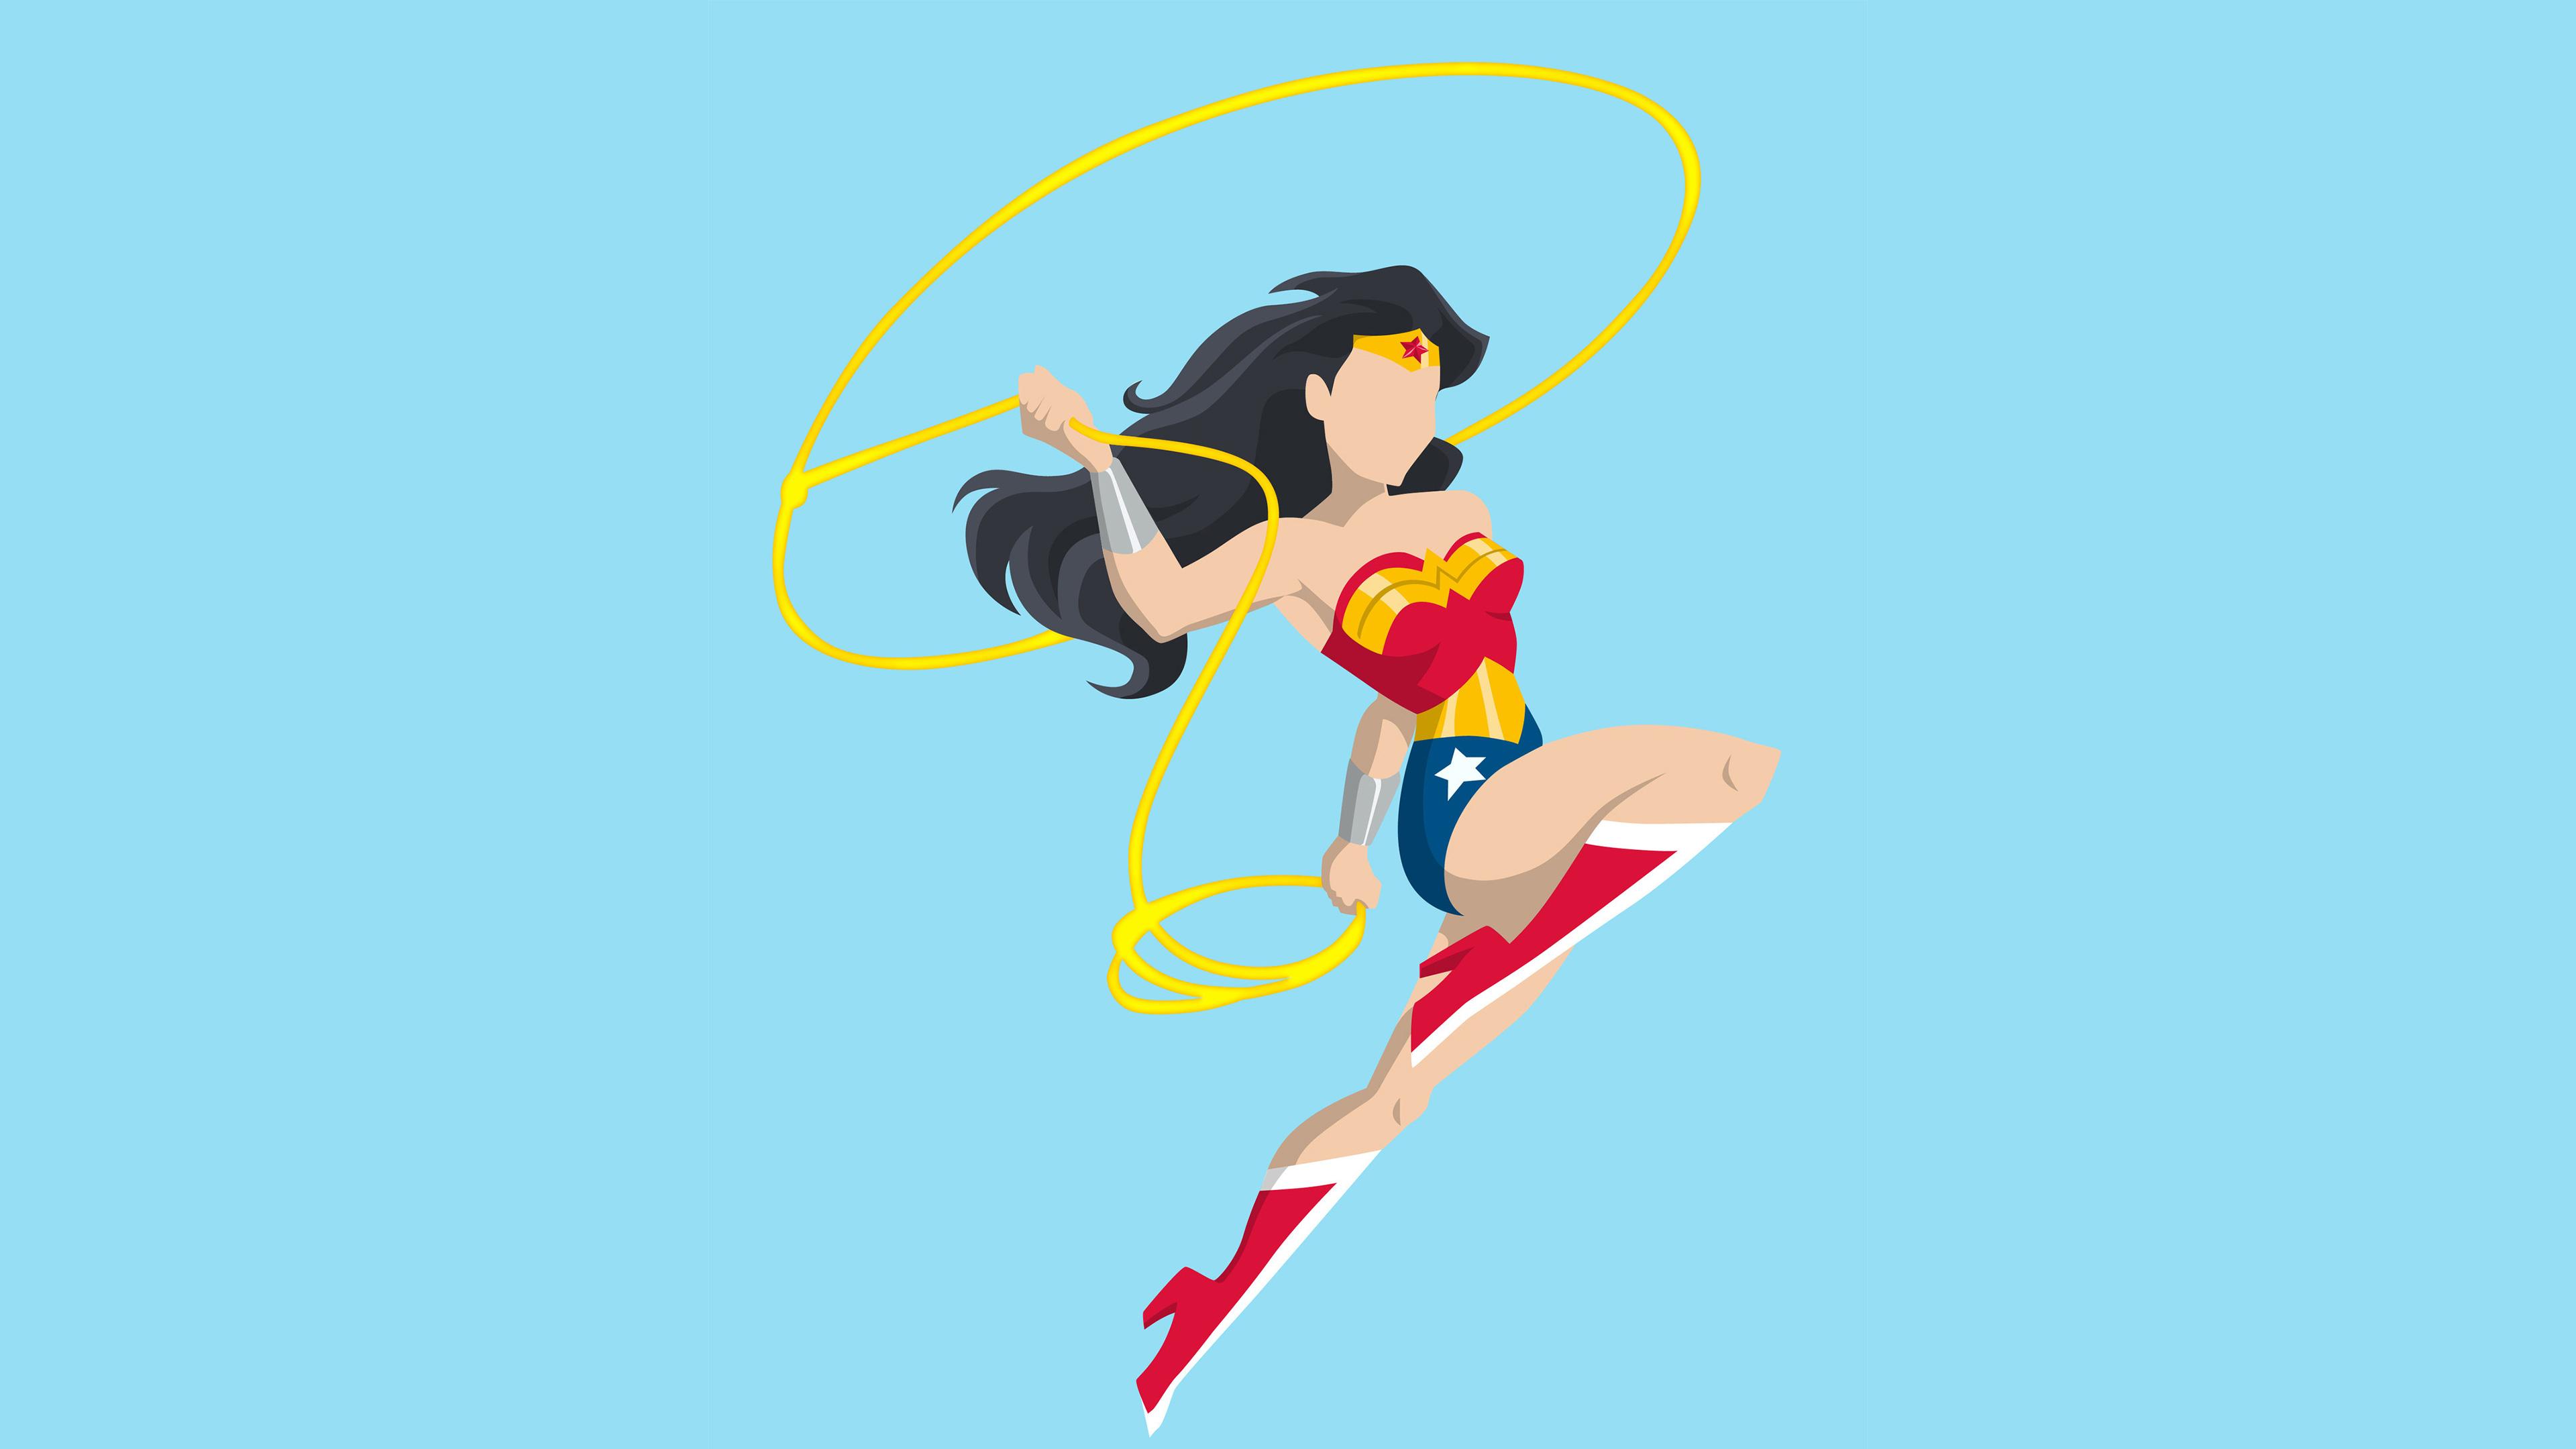 wonder woman vector style 1536521937 - Wonder Woman Vector Style - wonder woman wallpapers, hd-wallpapers, digital art wallpapers, artwork wallpapers, artstation wallpaperssuperheroes wallpapers, artstation wallpapers, 4k-wallpapers